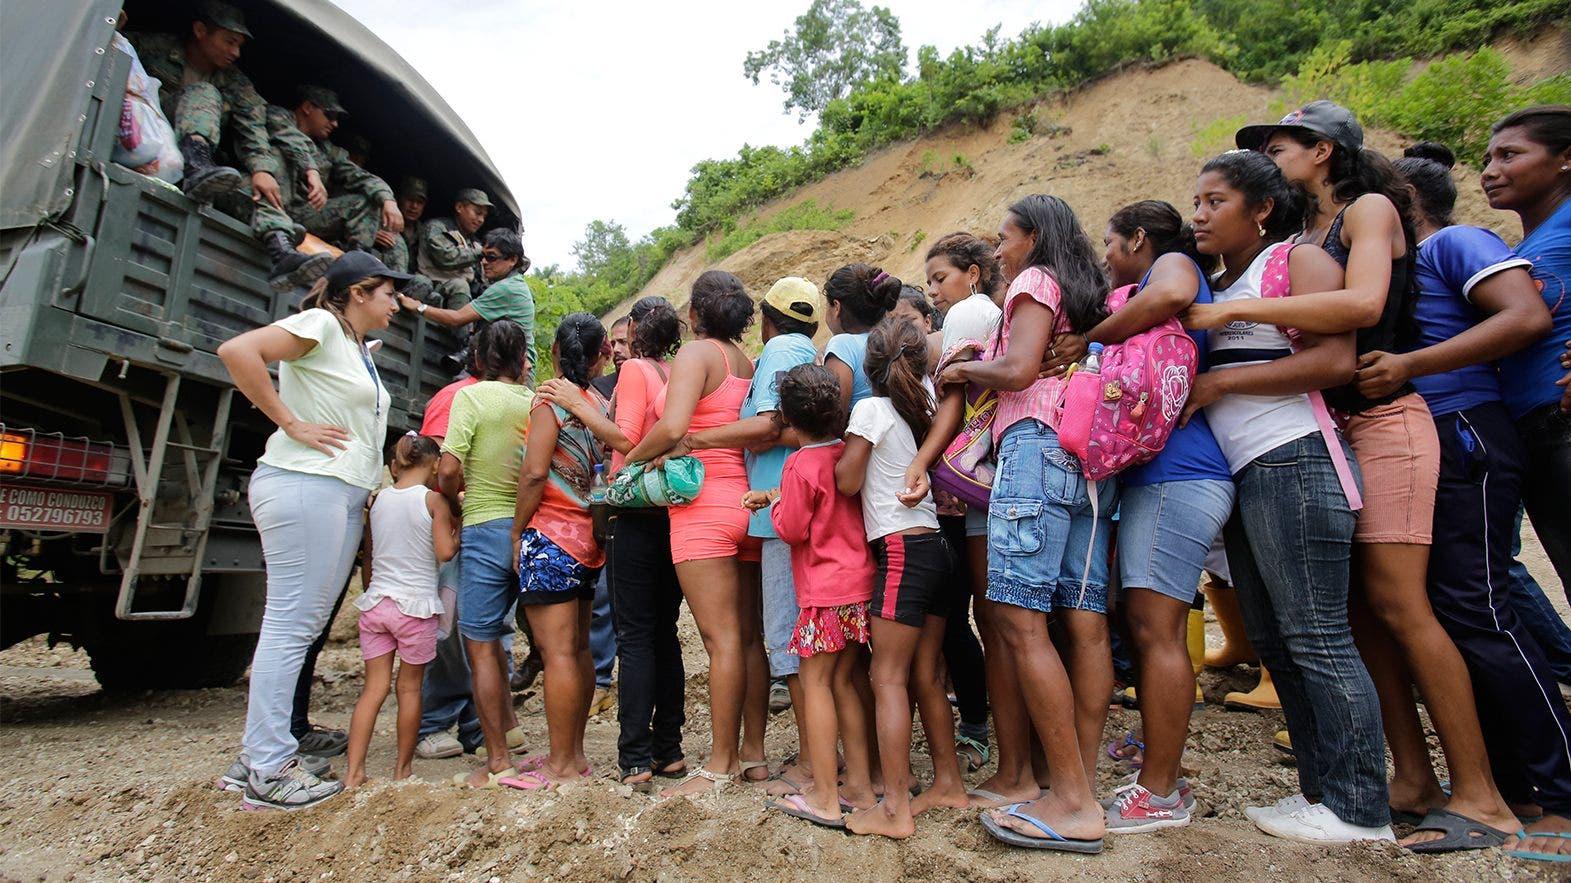 Ecuador quake death toll rises to nearly 600; country faces massive rebuilding | Fox News